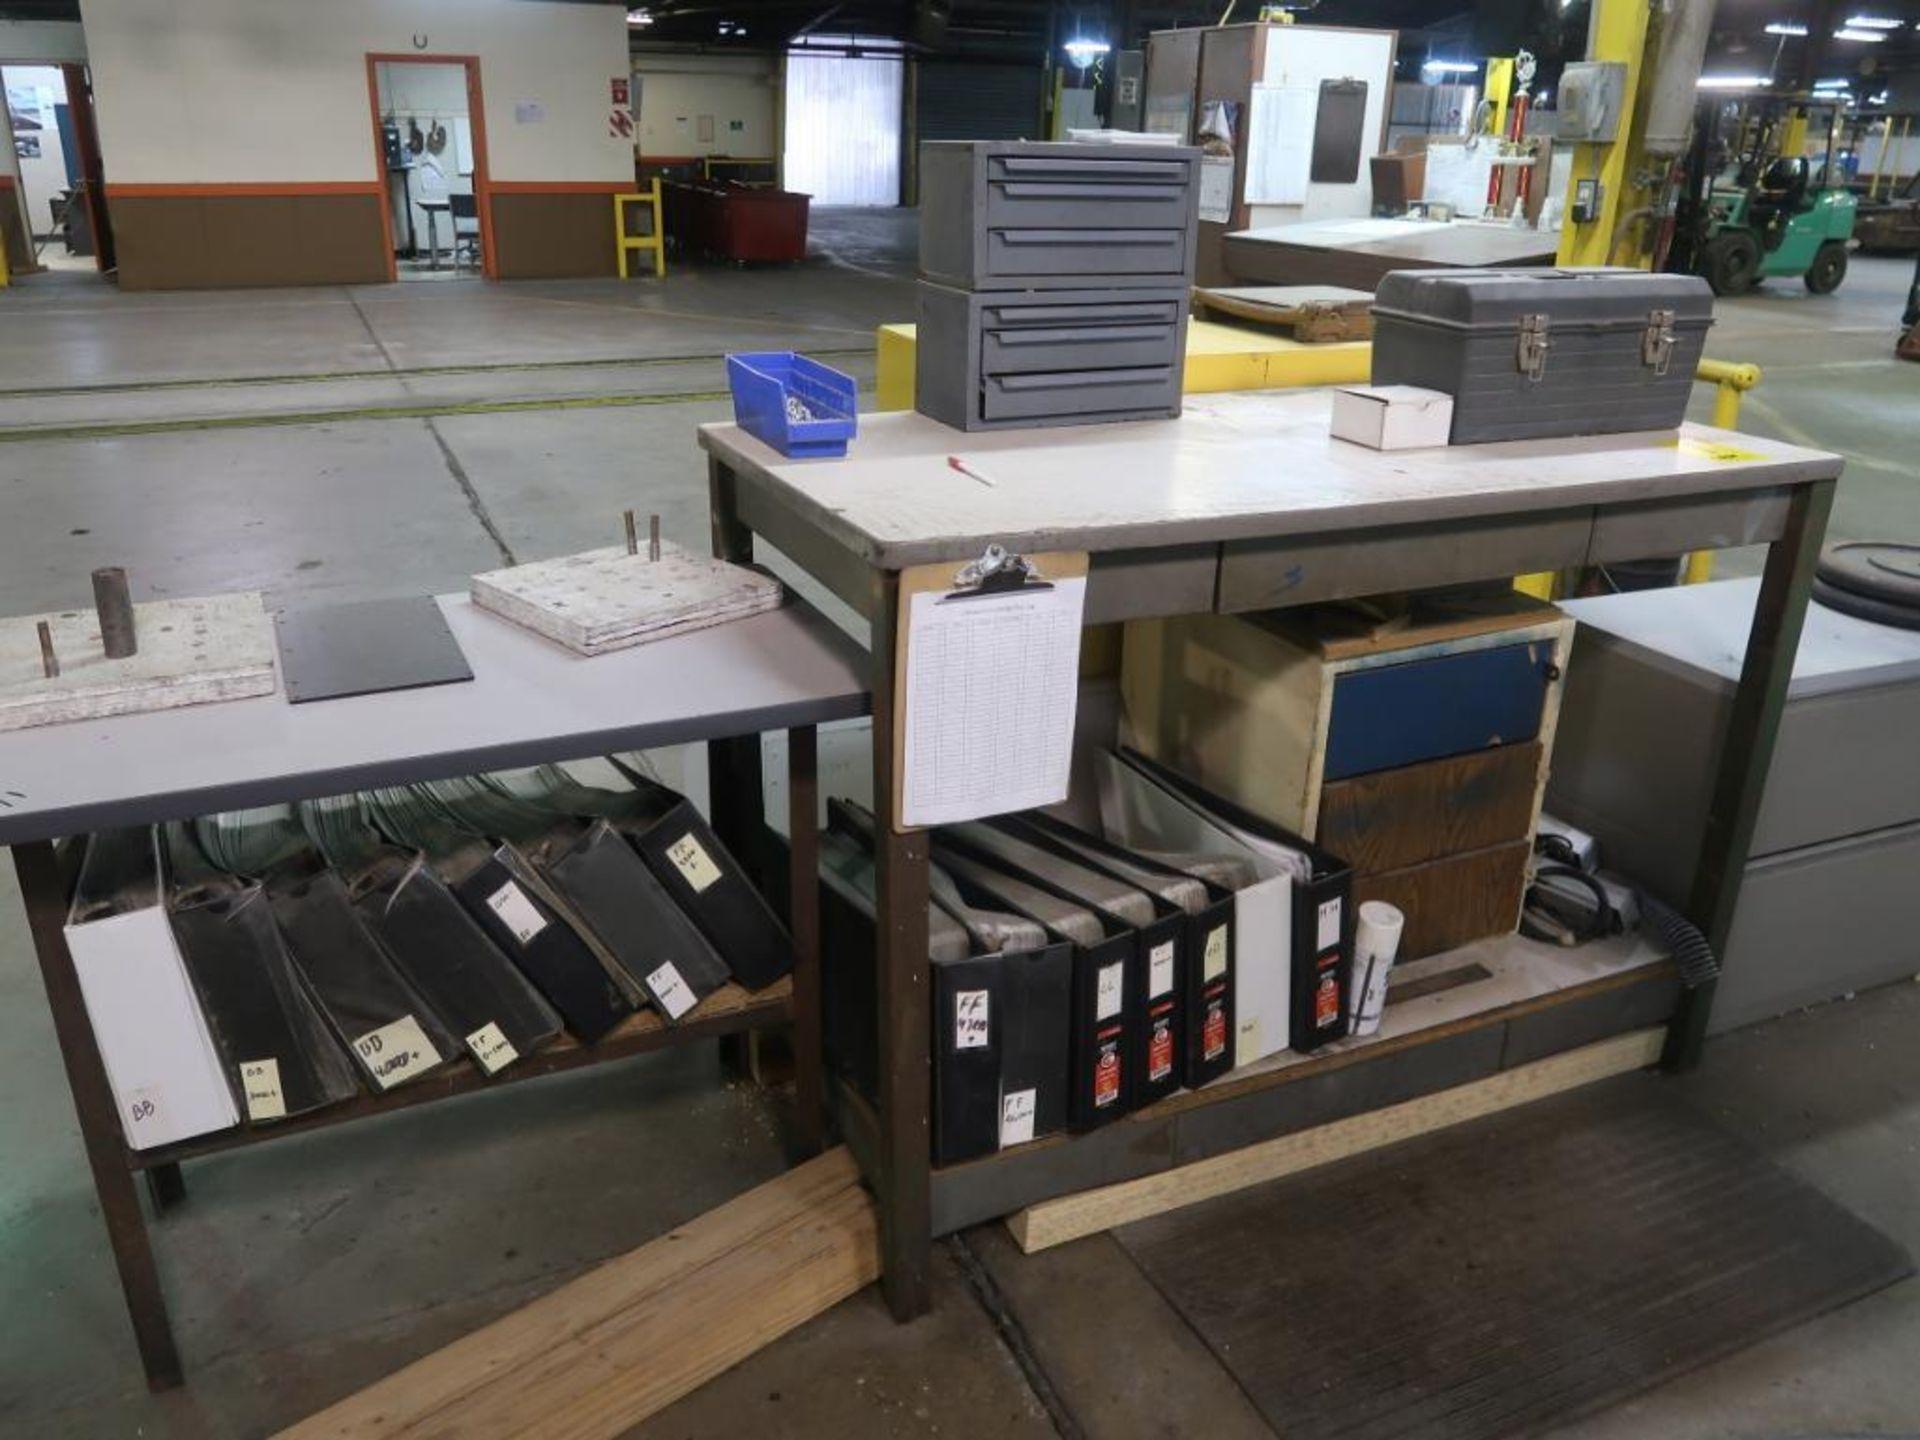 Lot 1 - CR Onsrud CNC Super Duty Series Router Model 14CC18D, S/N 146C101102 (2011), (2) 73 in. x 60 in.